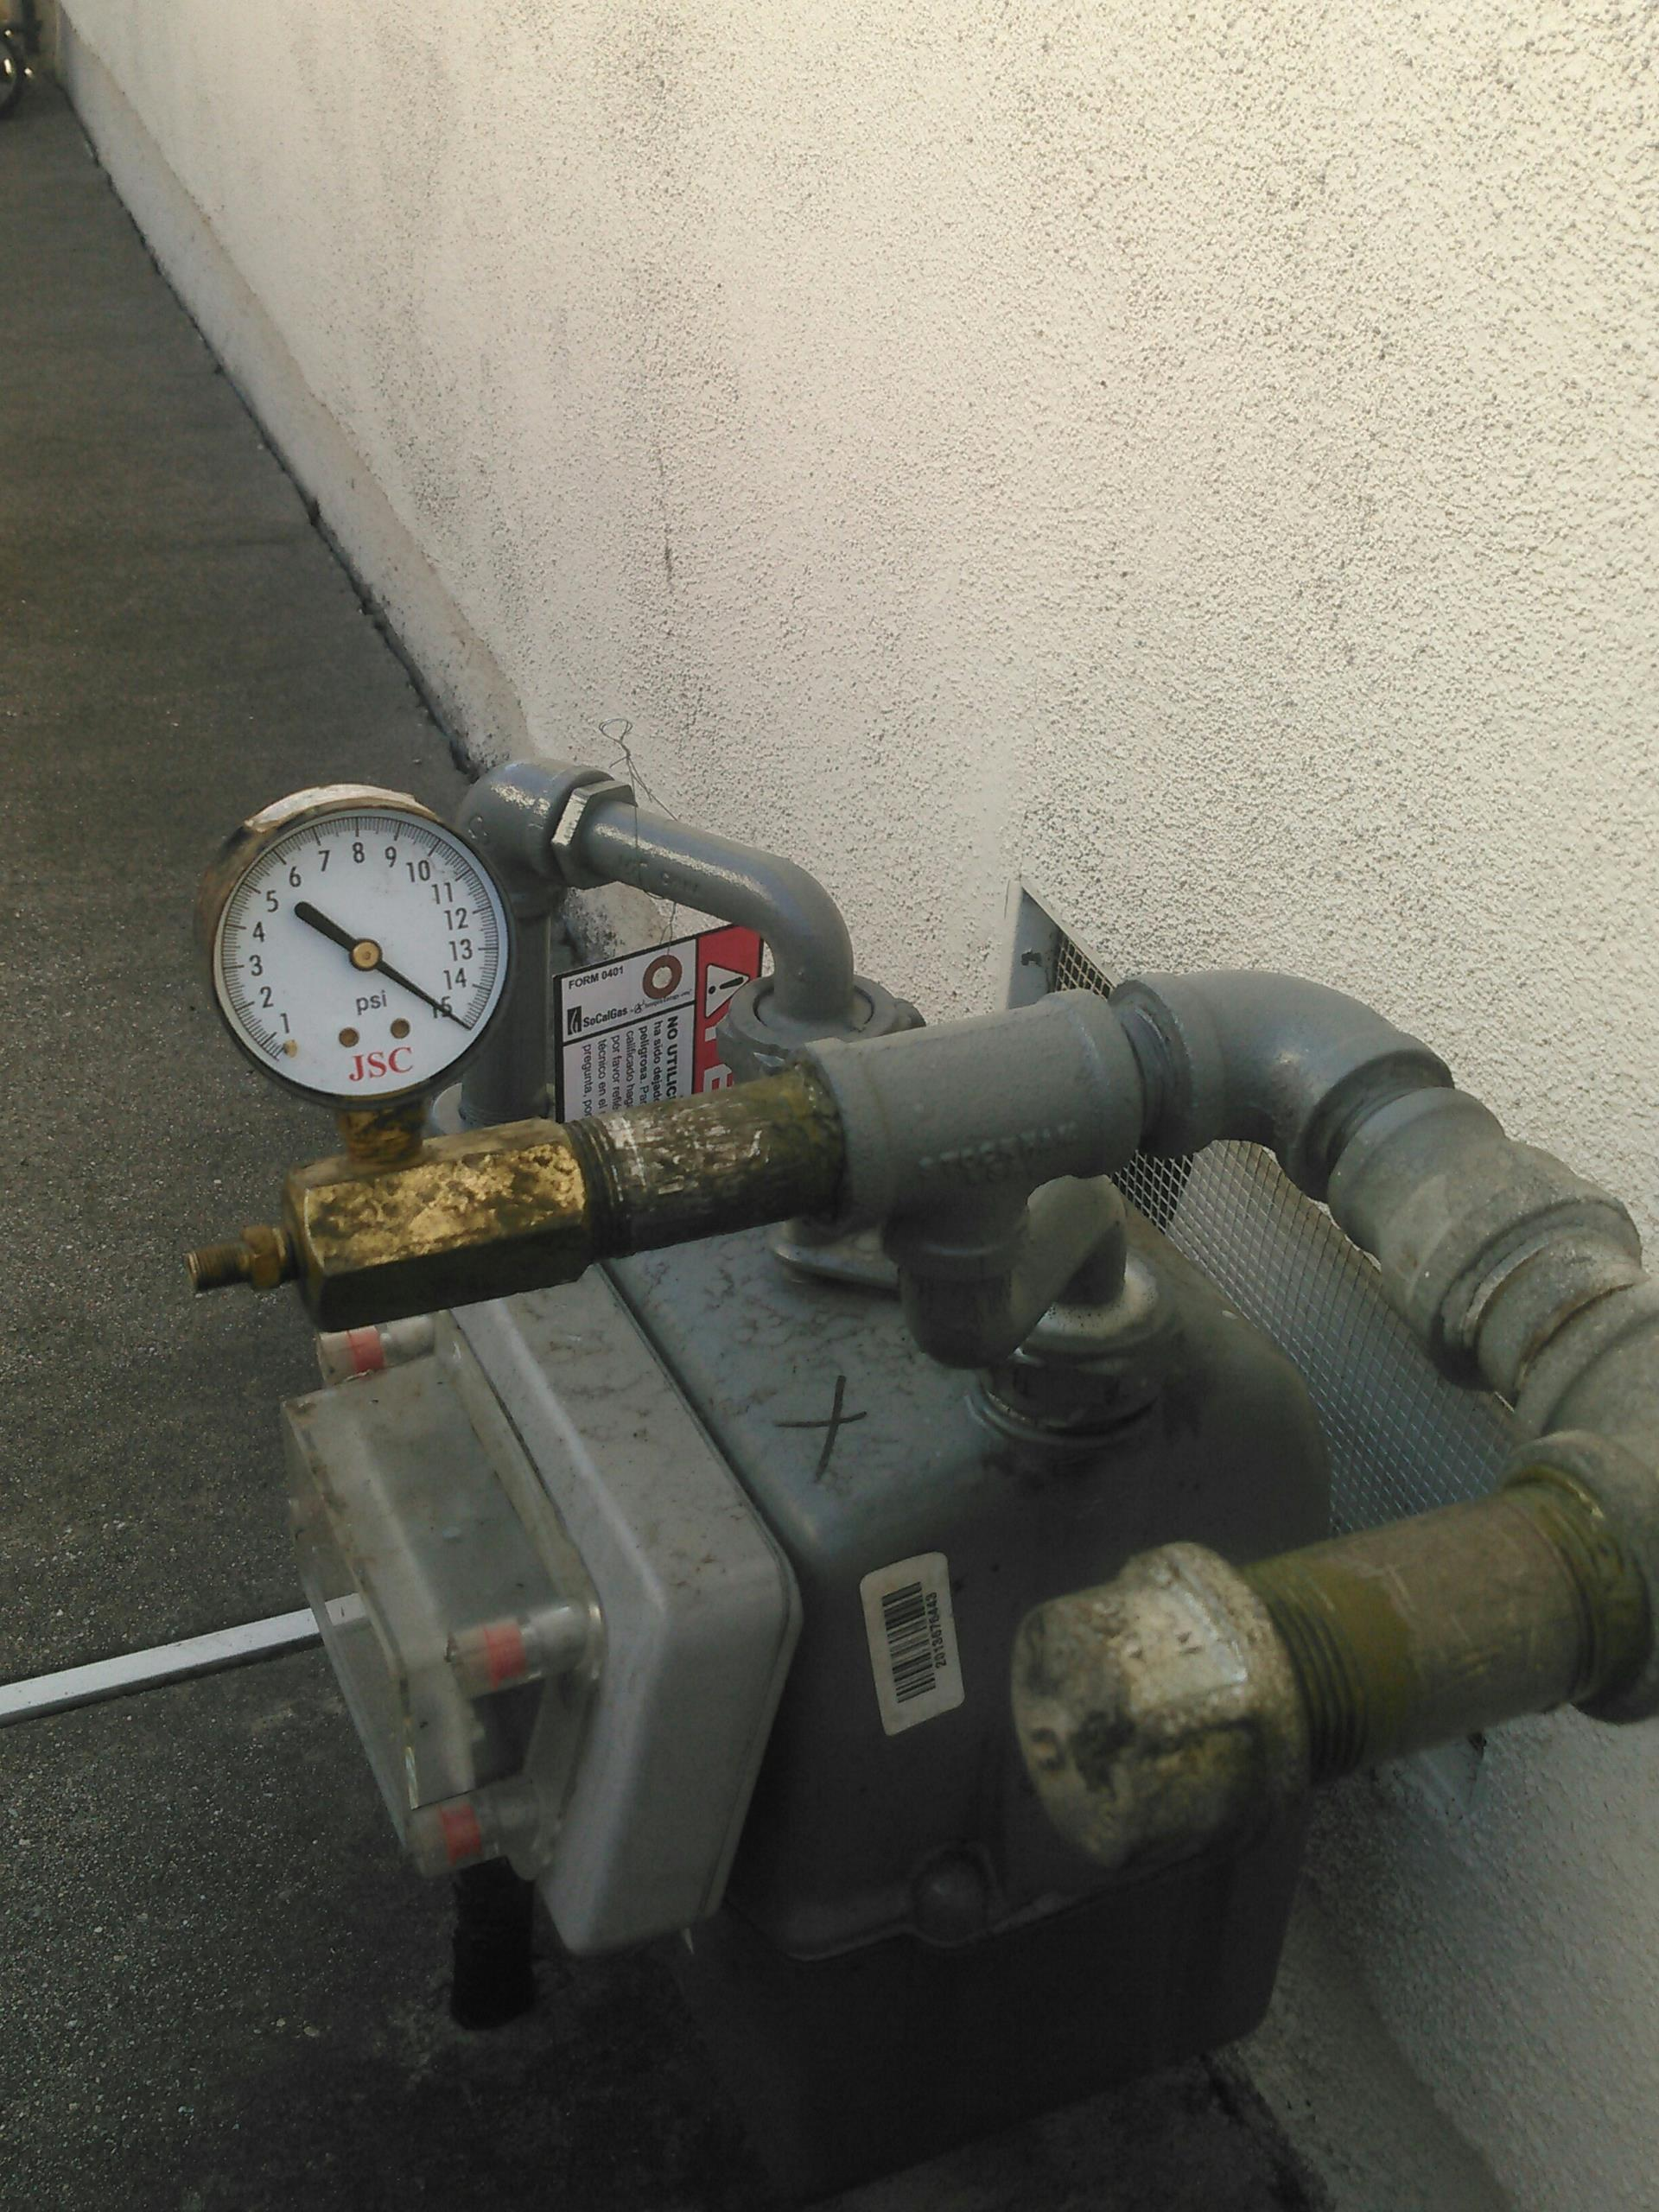 Rosemead, CA - Gas leak test